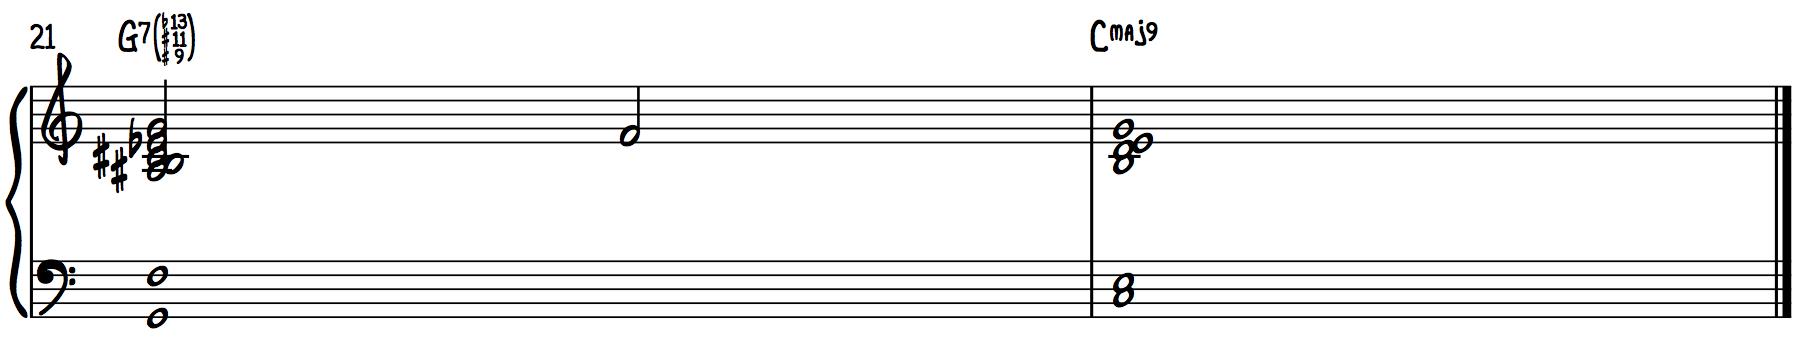 Altered Chords (b13, #11, #9 Chords) Dominant harmonize chord progression